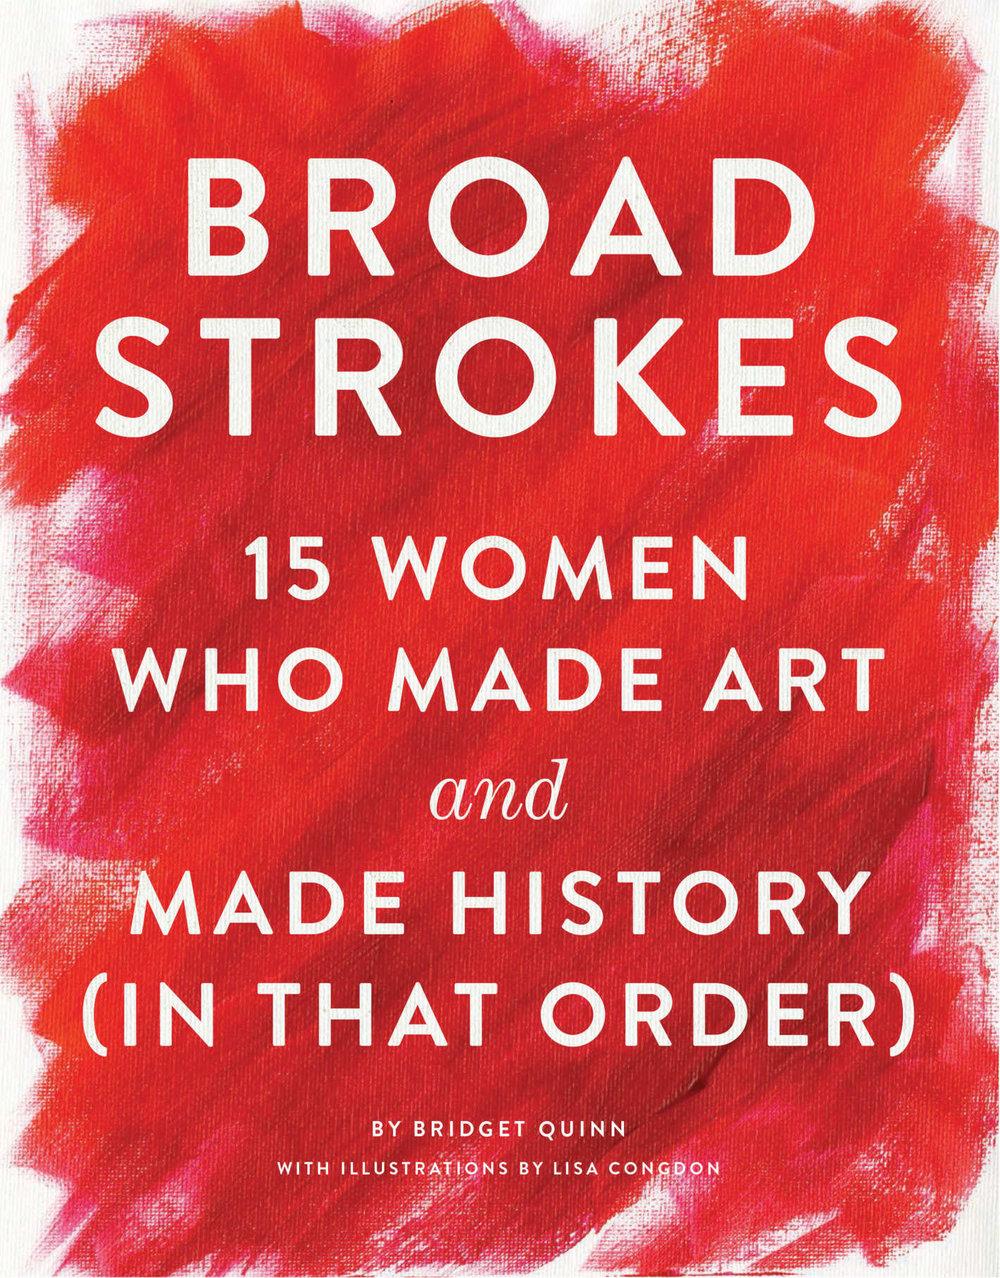 broad strokes by bridget quinn.jpg